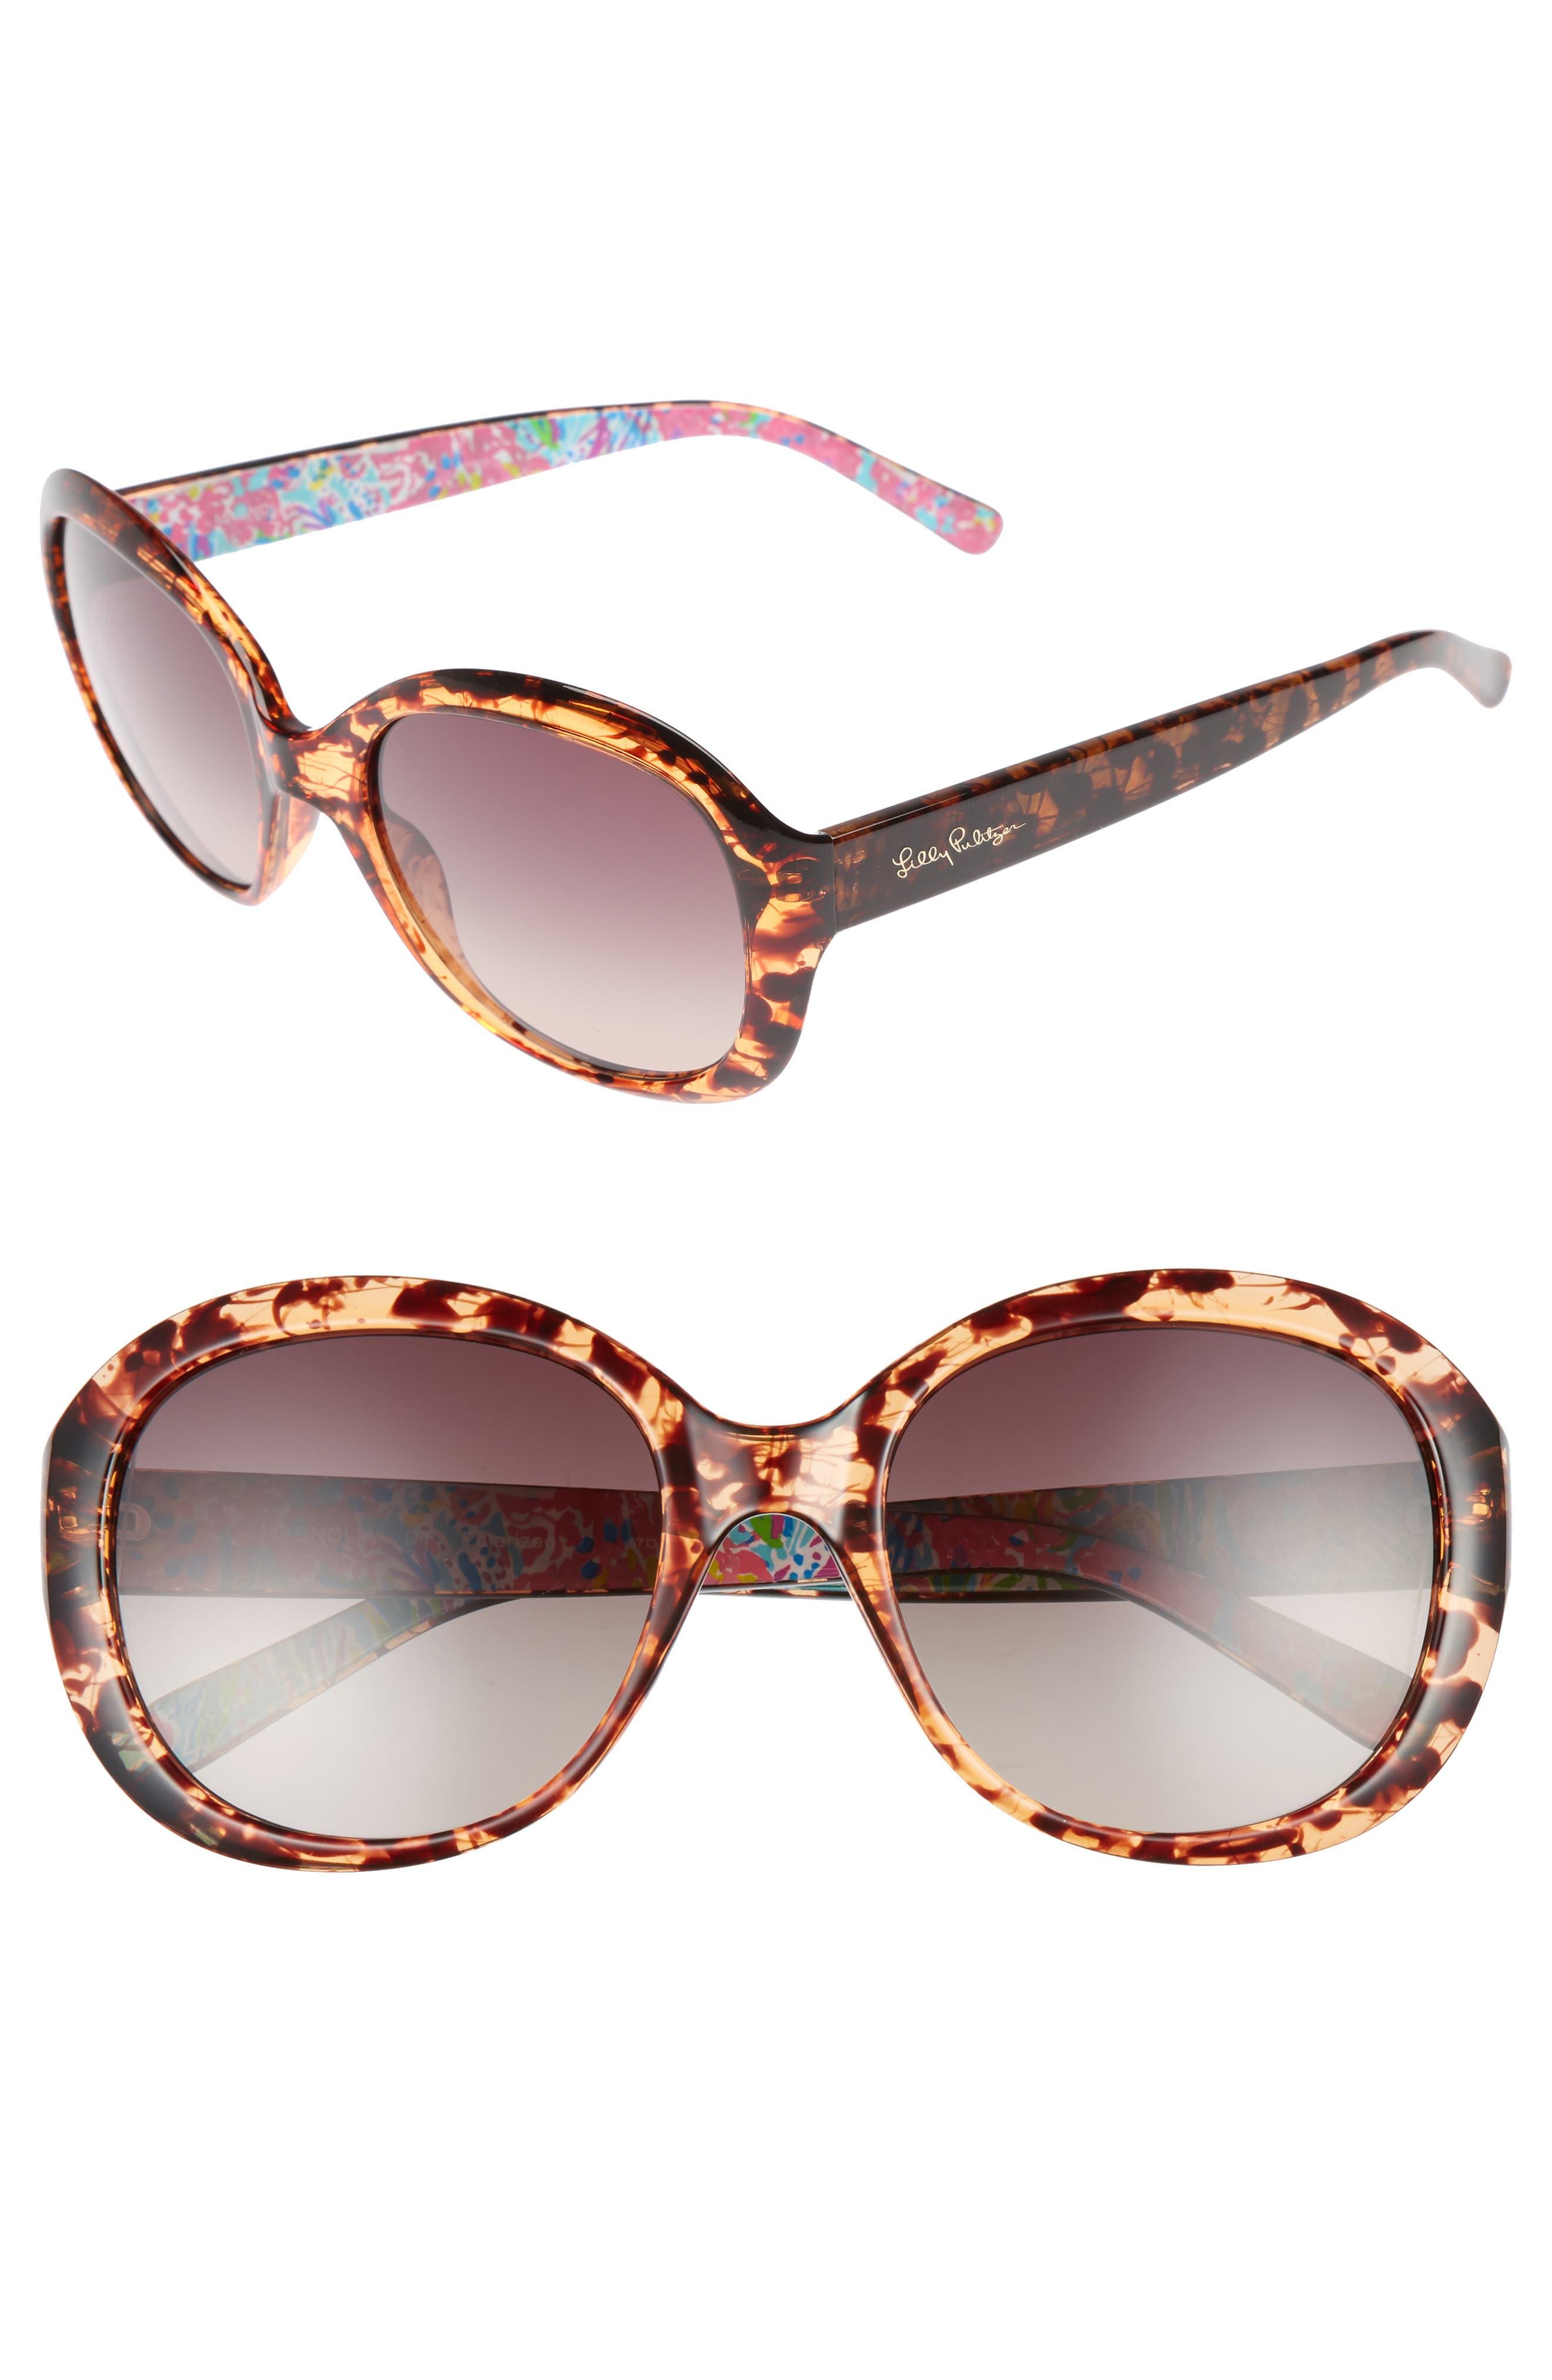 Magnolia 57mm Polarized Round Sunglasses,                             Main thumbnail 1, color,                             HAVANA